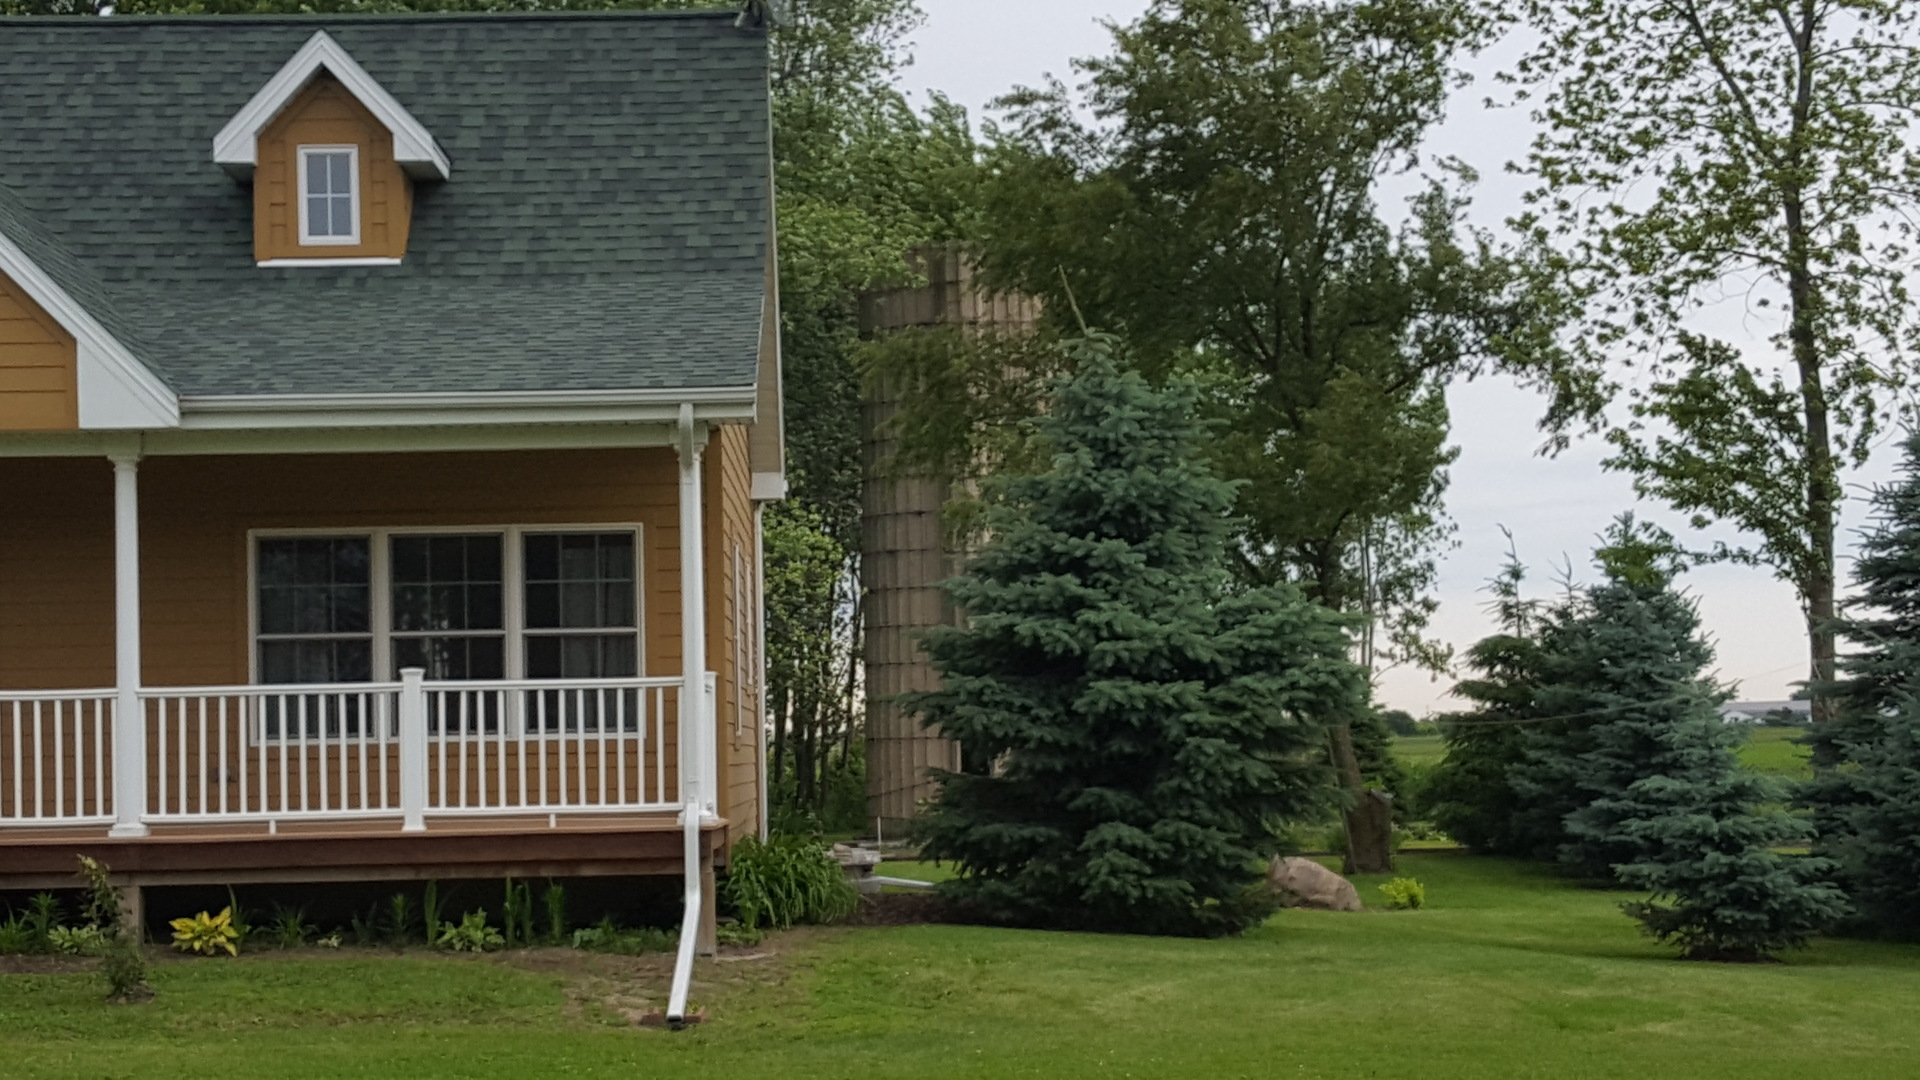 11356 West Stuenkel, Frankfort, Illinois, 60423